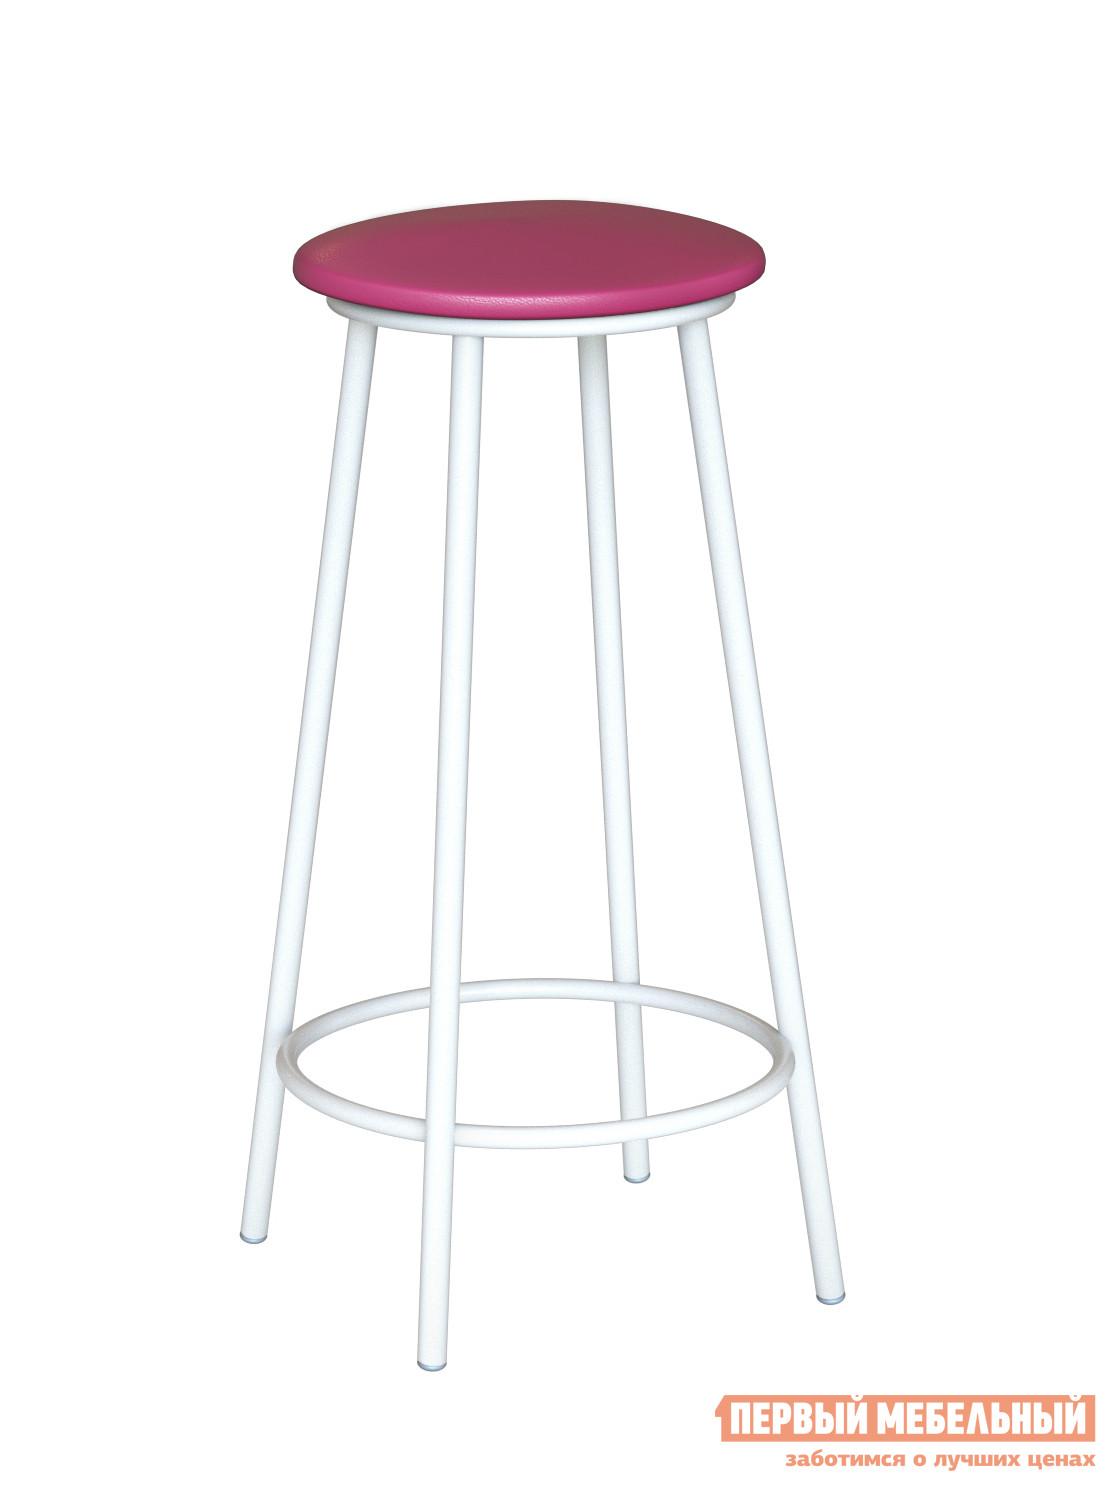 Круглый барный стул Первый Мебельный Табурет барный Рондо барный стул первый мебельный маркус